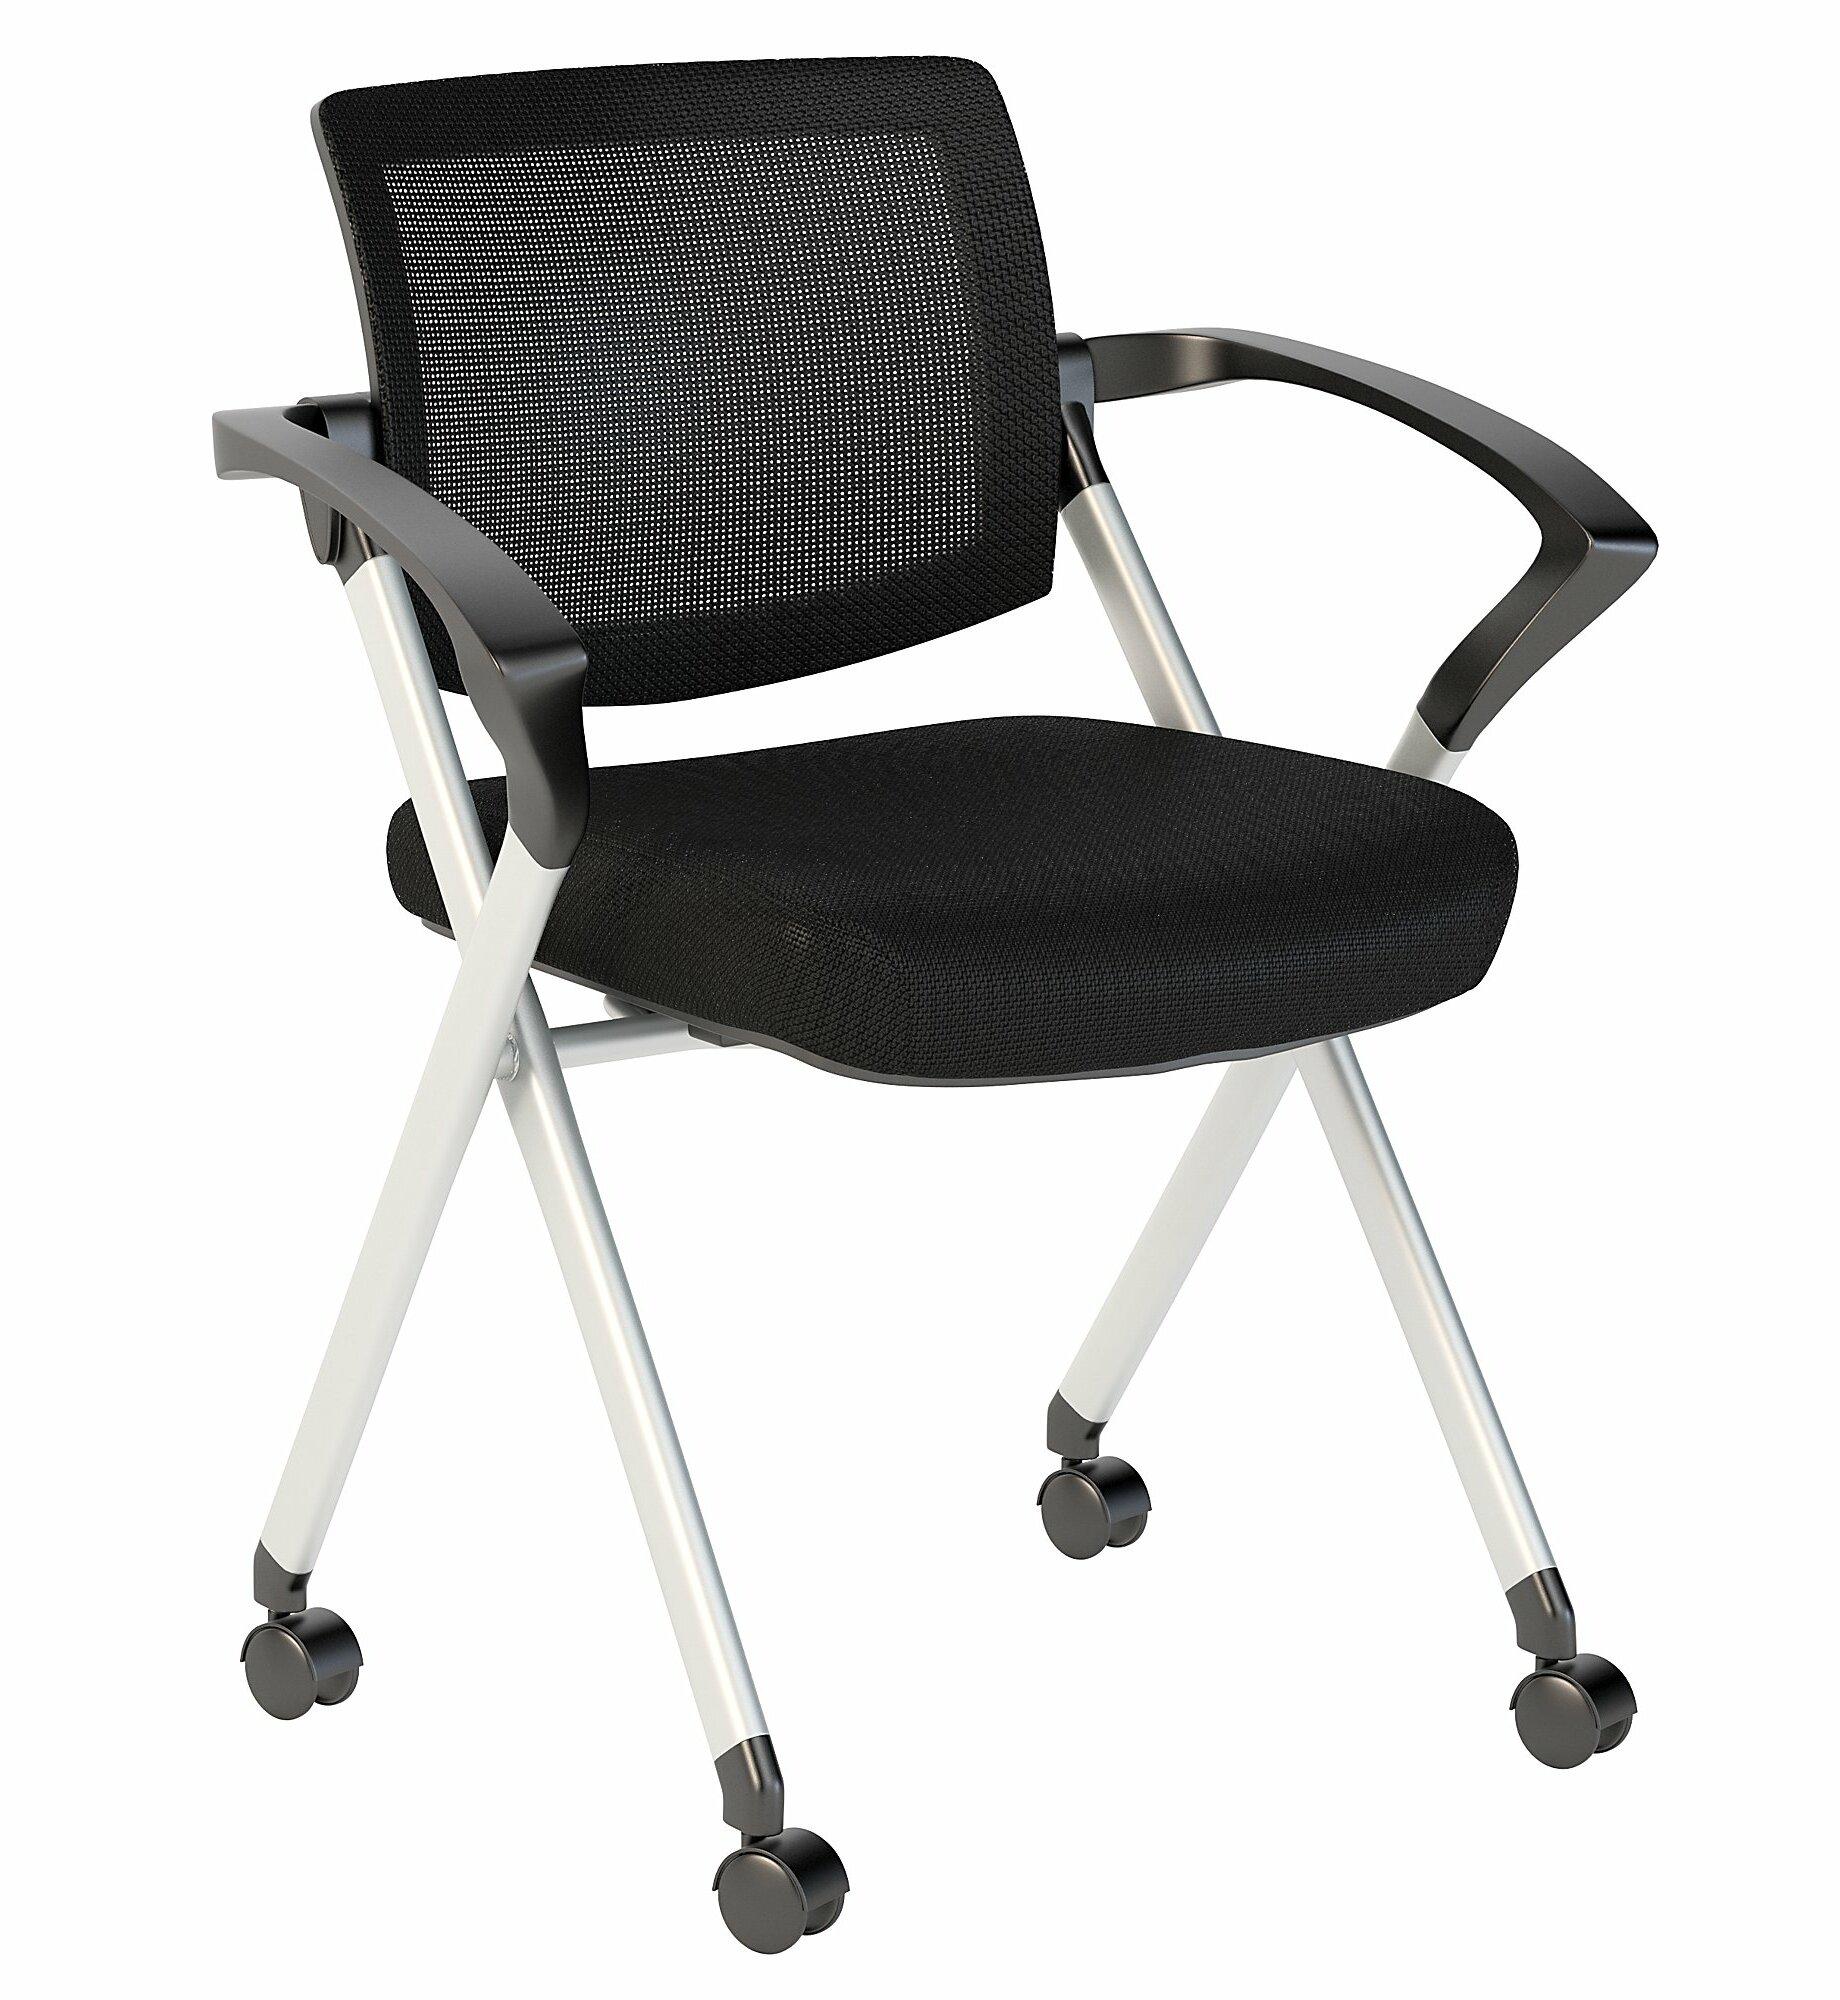 Image of: Bush Business Furniture Fabric Padded Folding Chair Wayfair